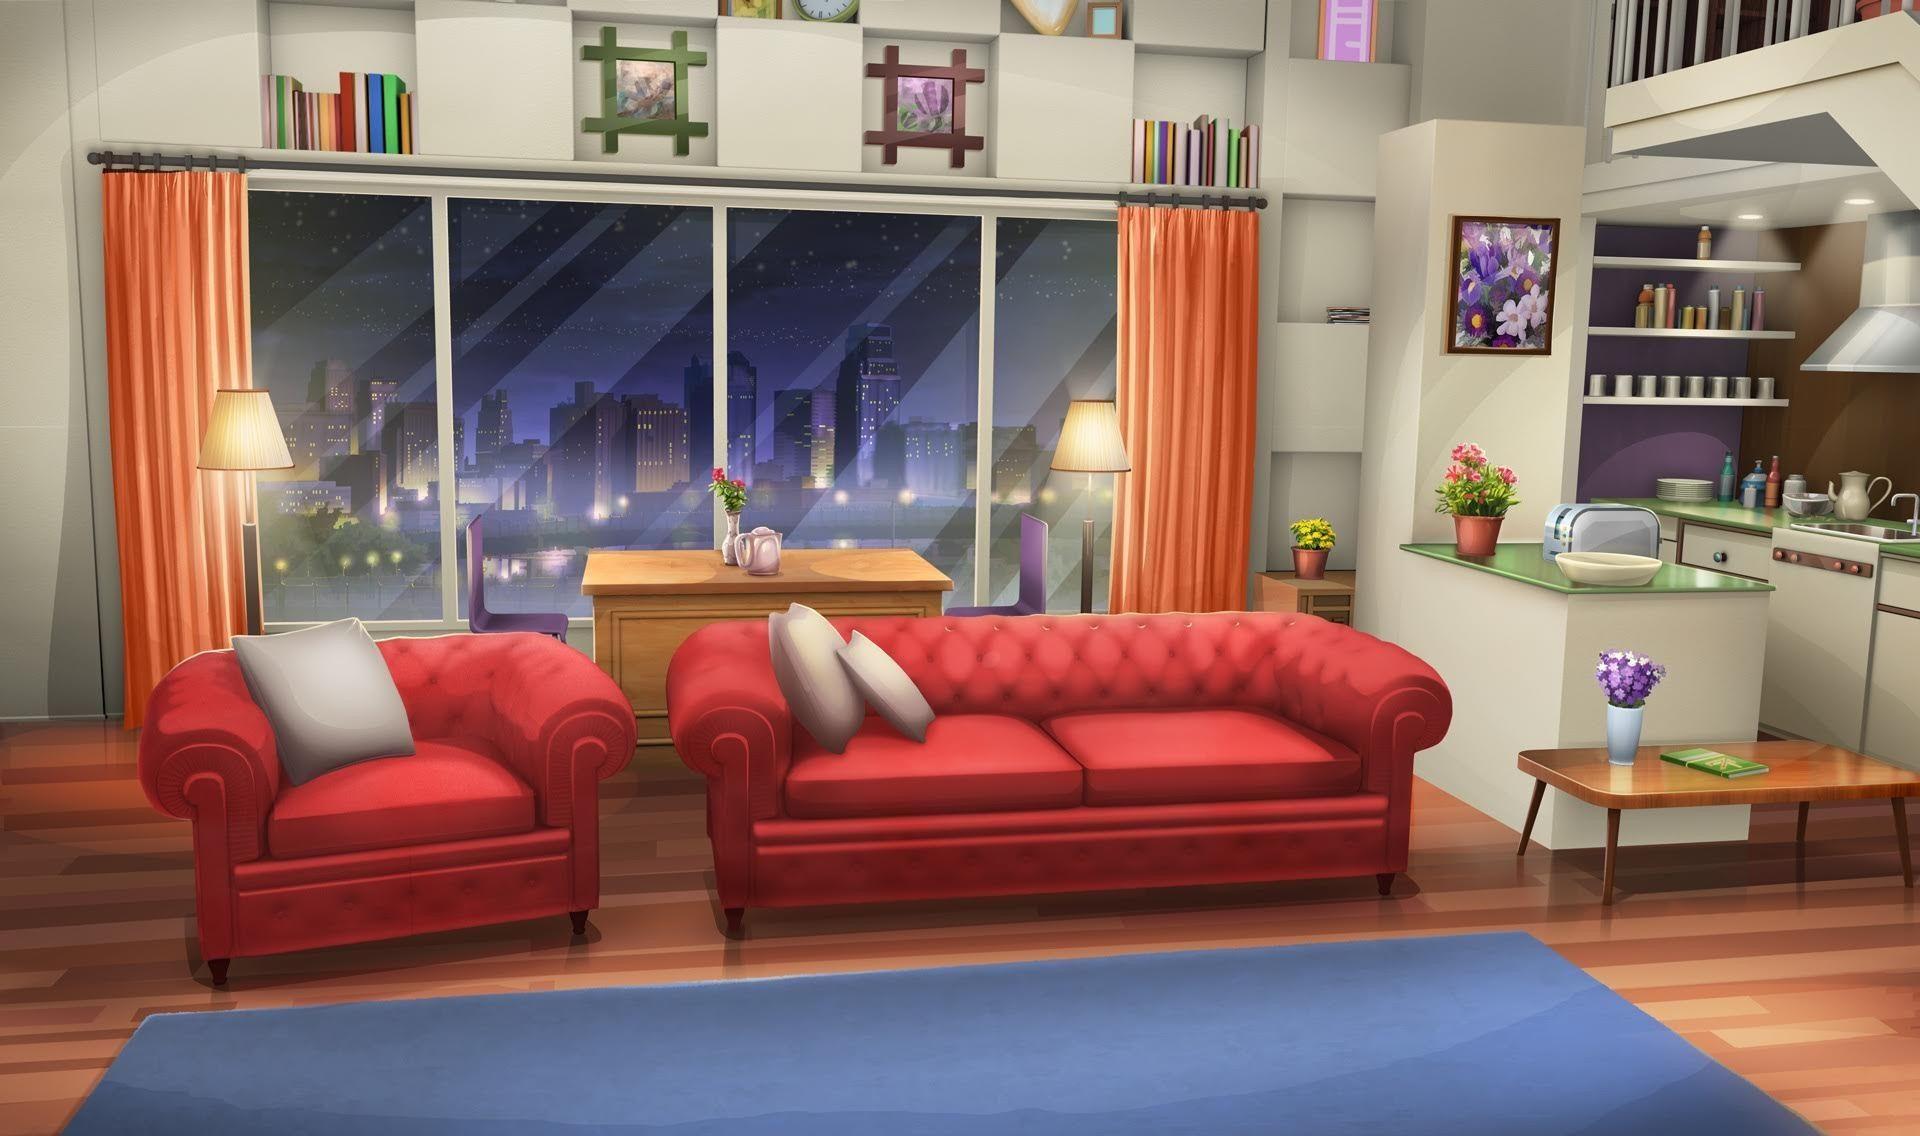 Pin By 𝚈𝚞𝚛𝚒 𝙺𝚘𝚞 ʚ ɞ On Anime Backrounds Living Room Background Wallpaper Living Room Anime Background